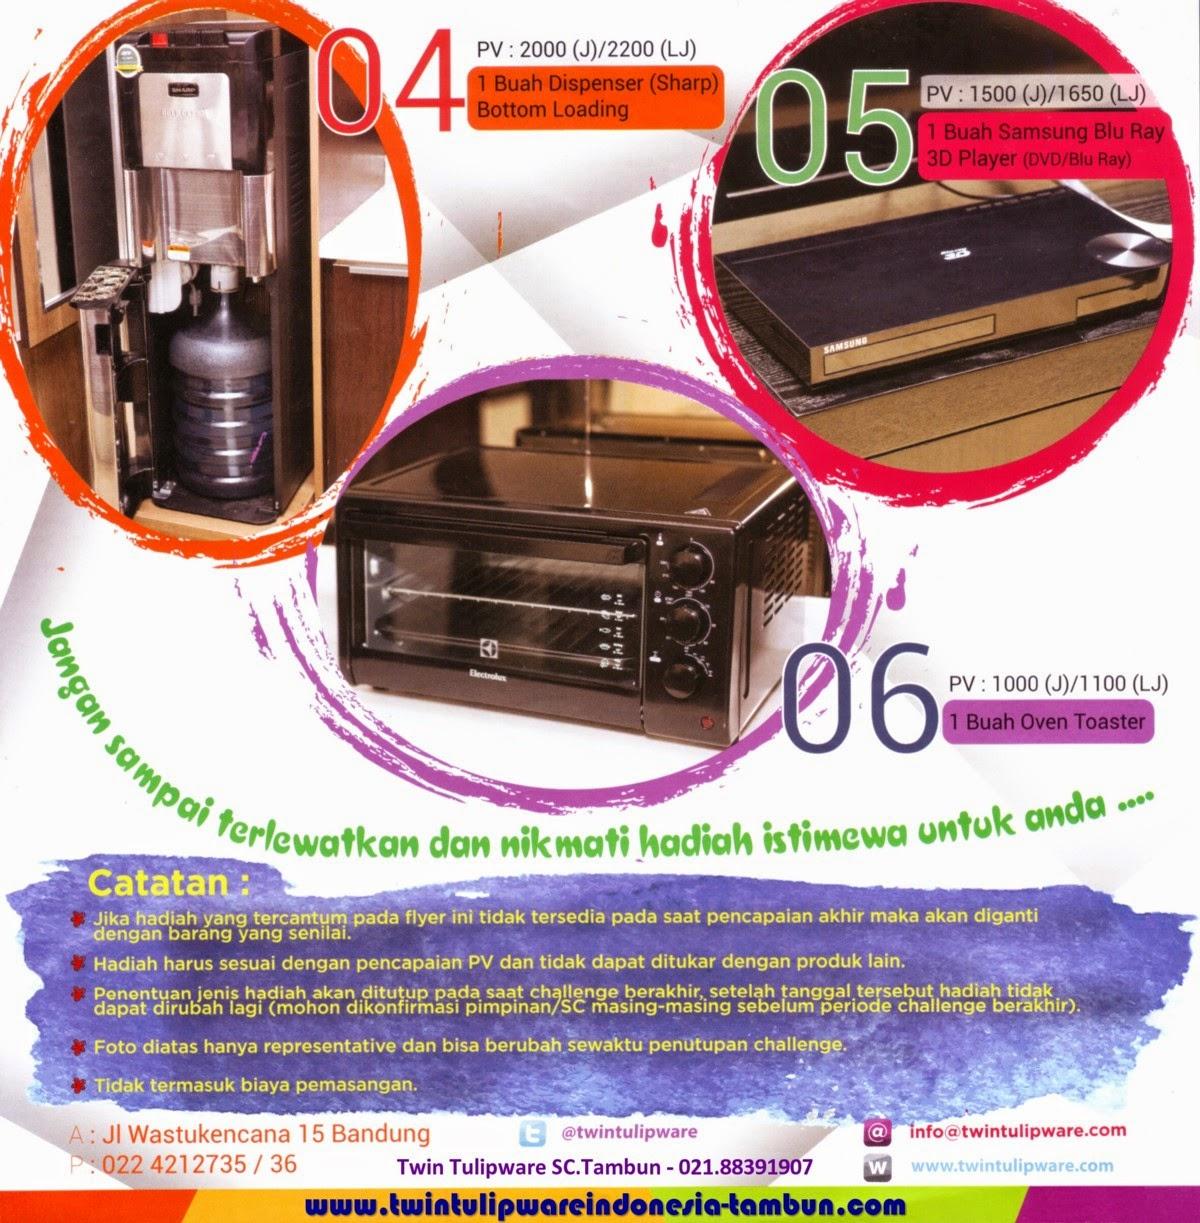 Marvelous Challenge Twin Tulipware 2015, Dispenser Sharp, Samsung Blu Ray 3D Player, Oven Toaster